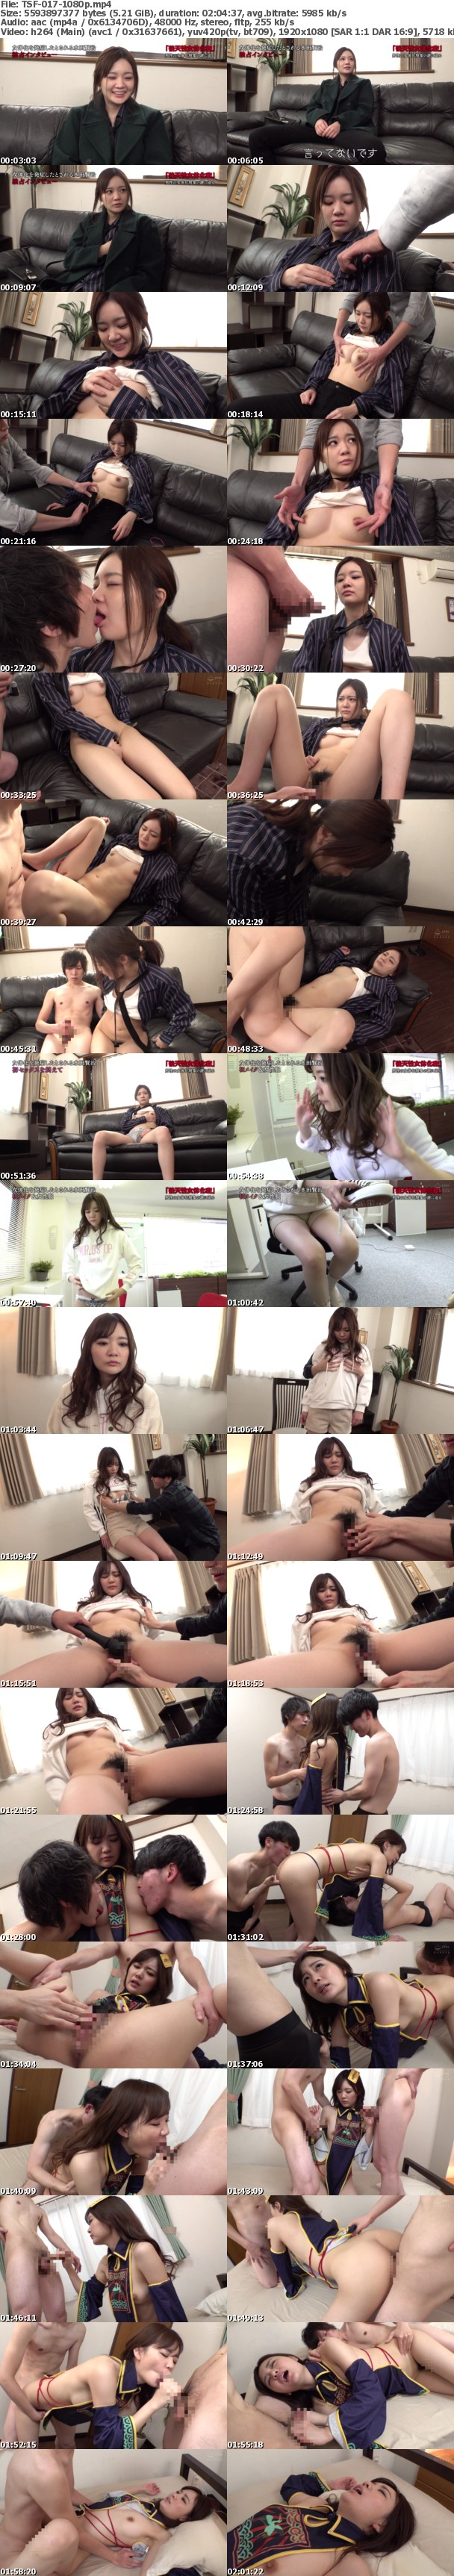 (Full HD) TSF-017 朝起きたら女になってた会社員男性(24)を徹底取材 マッチングアプリを常用する女好きクンをメス堕ちさせて、おま●こセックス大好きにさせる 水田賢治